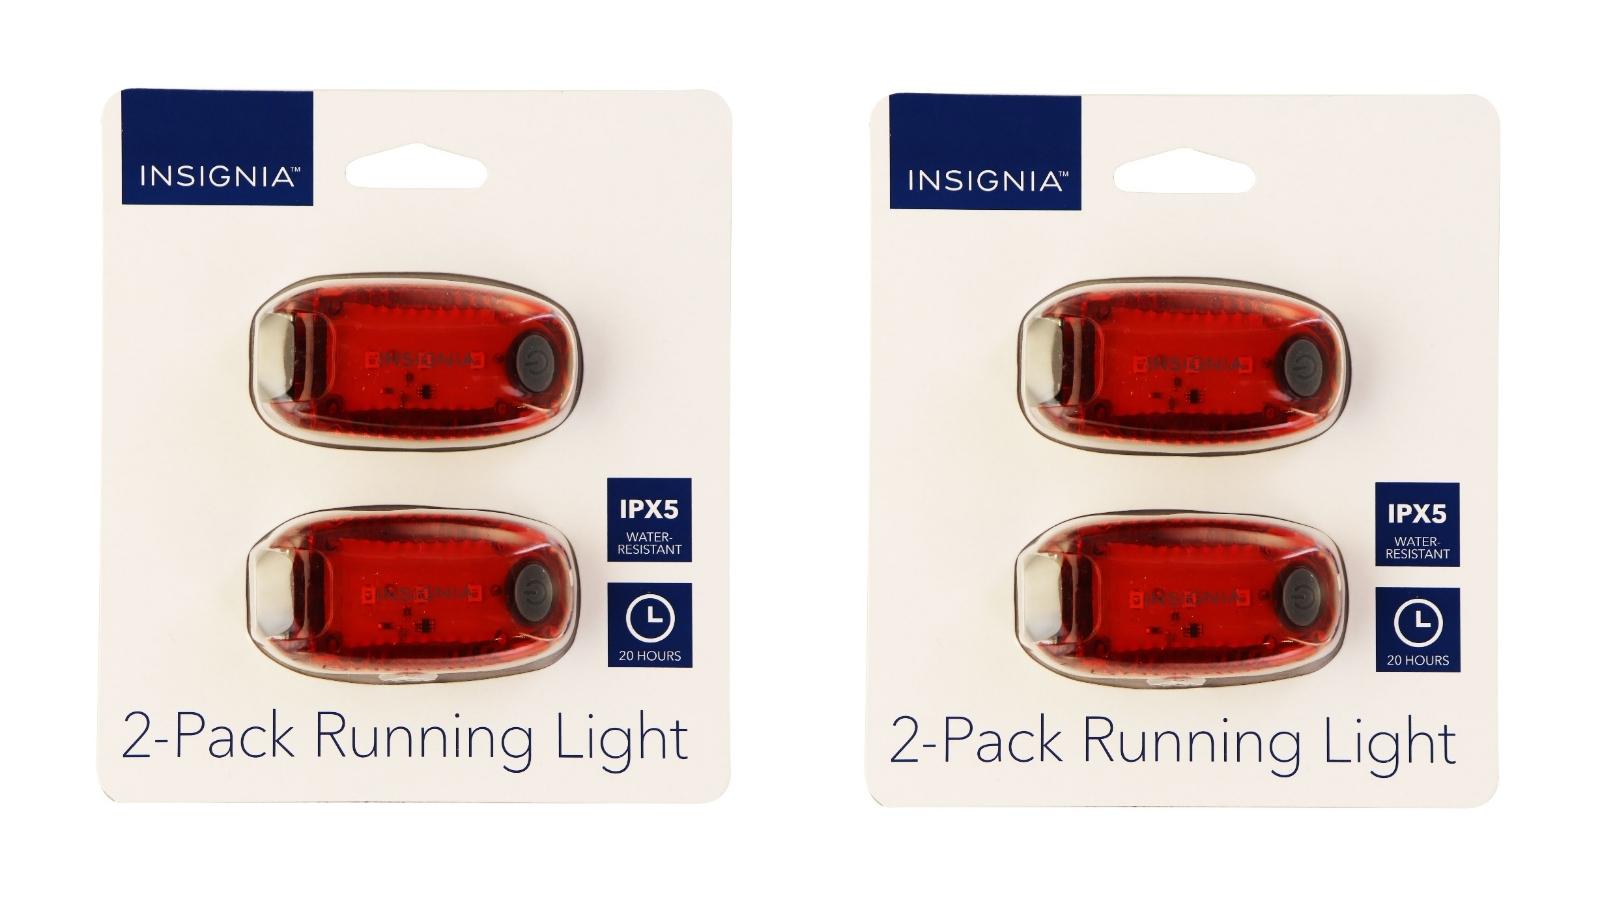 Insignia 2x (2 Pack of LED) Running Lights for Running/Walking/Biking - Red